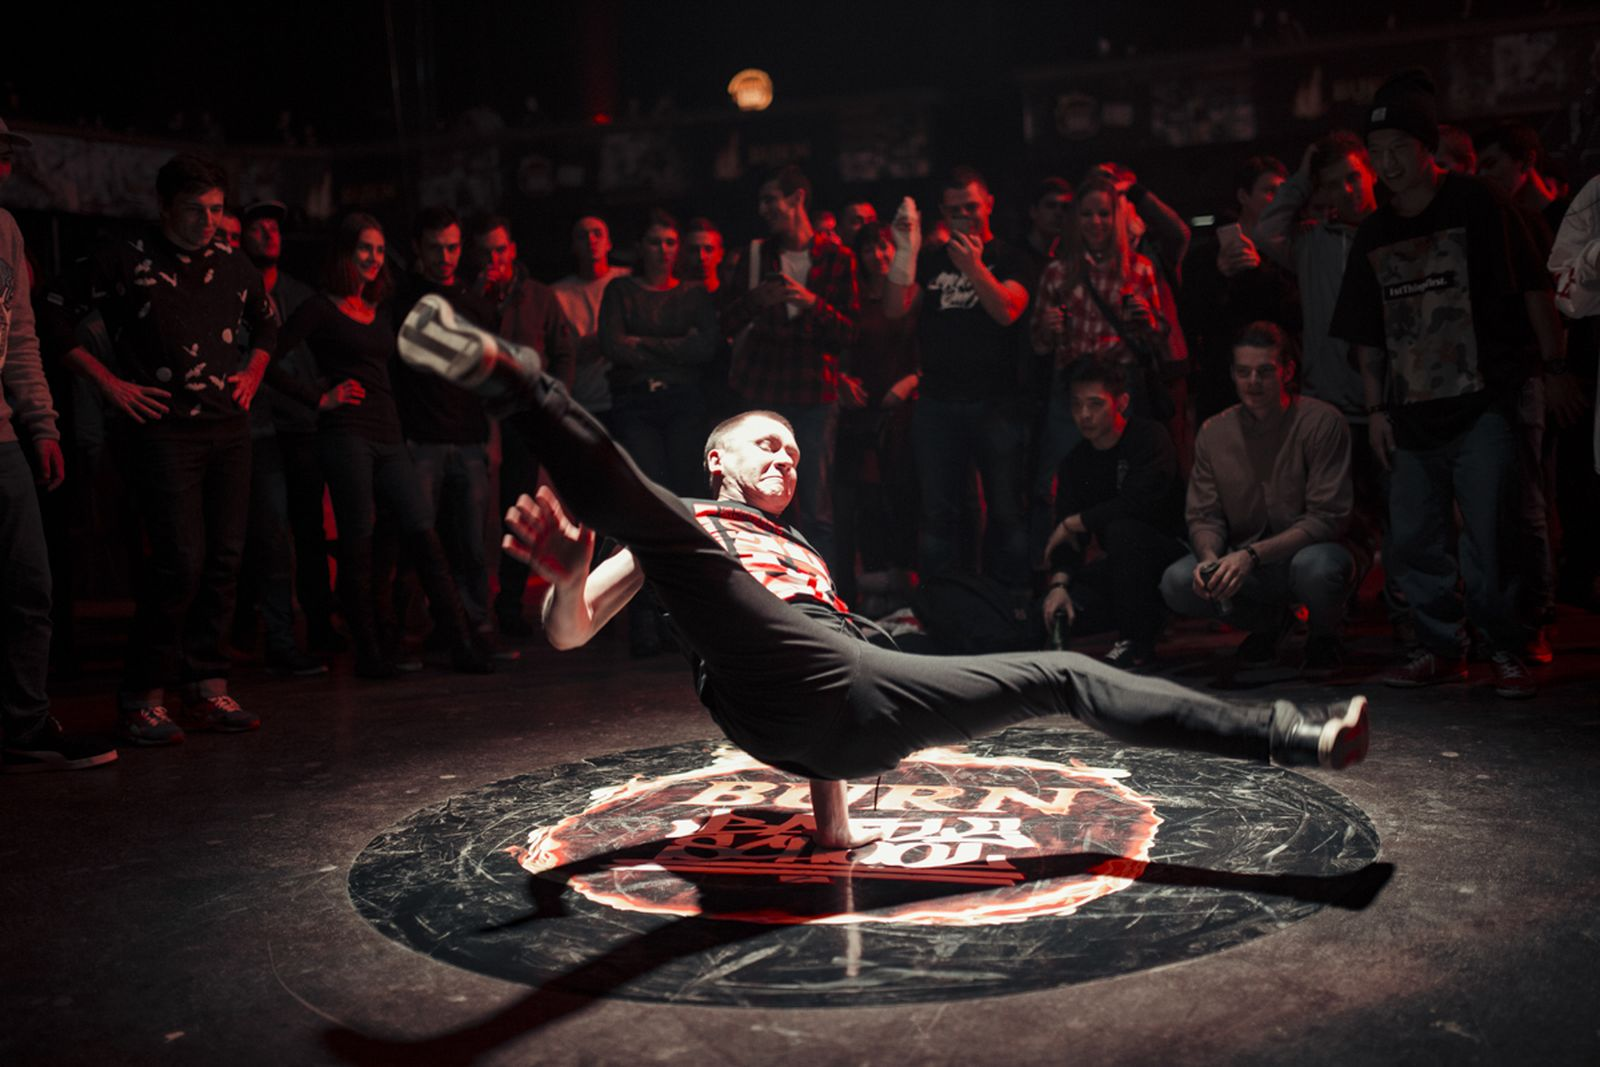 burn-battle-school-moscow-dancers2